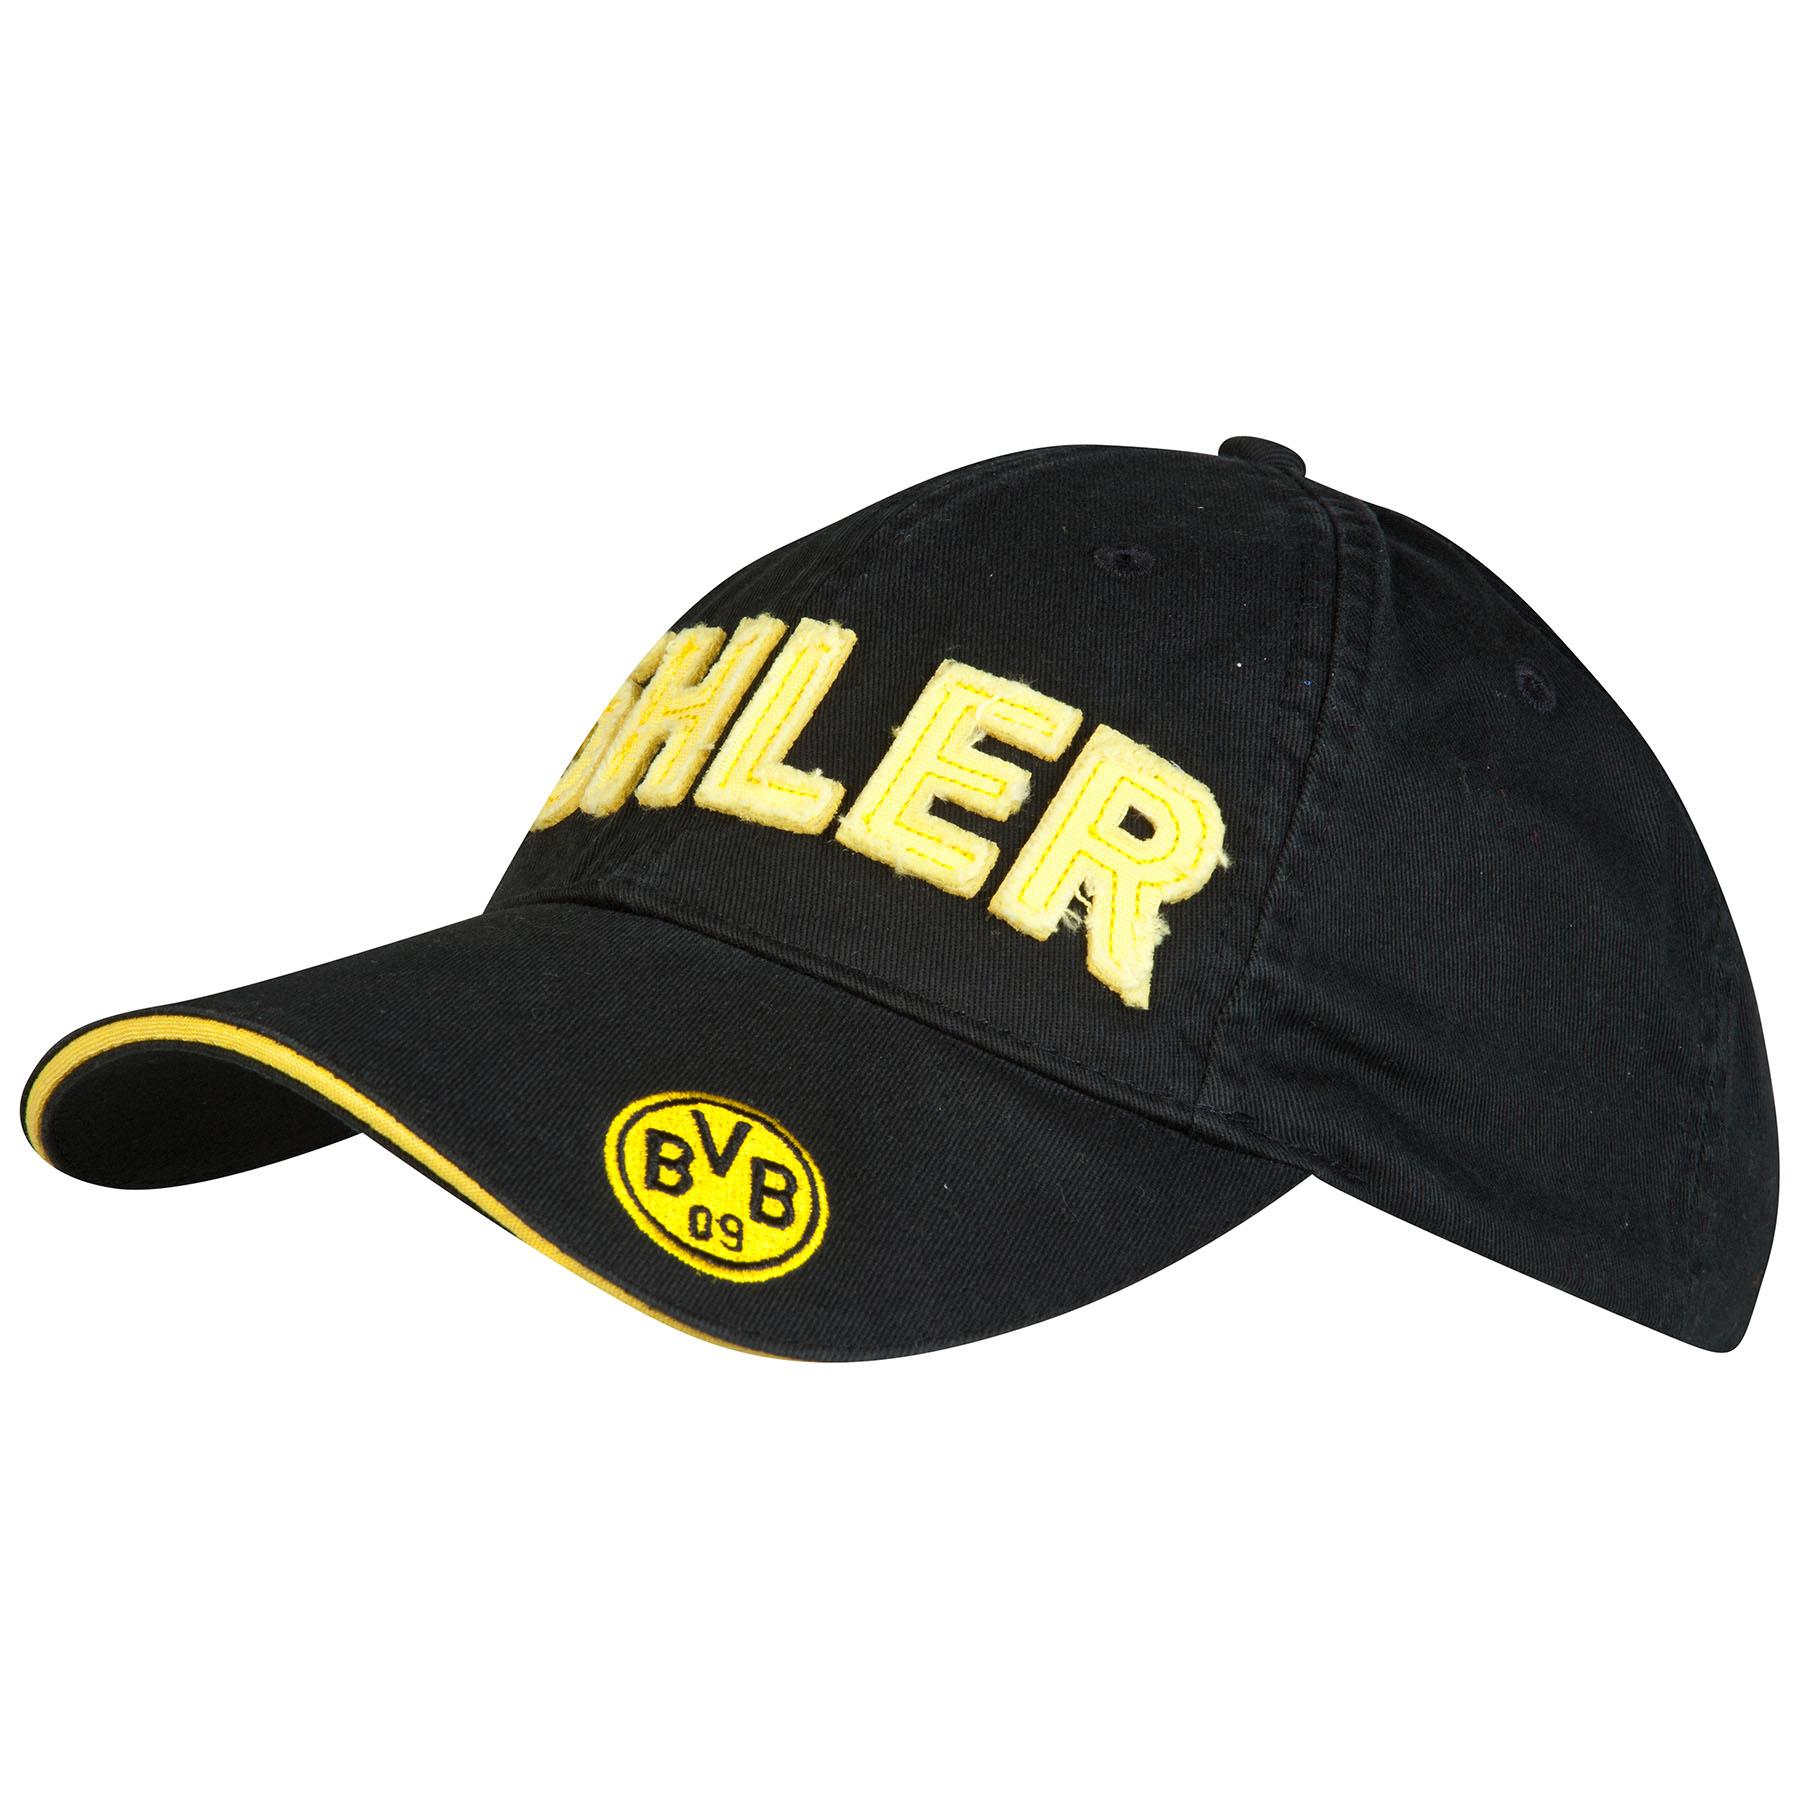 BVB Pohler Cap – Black/Yellow